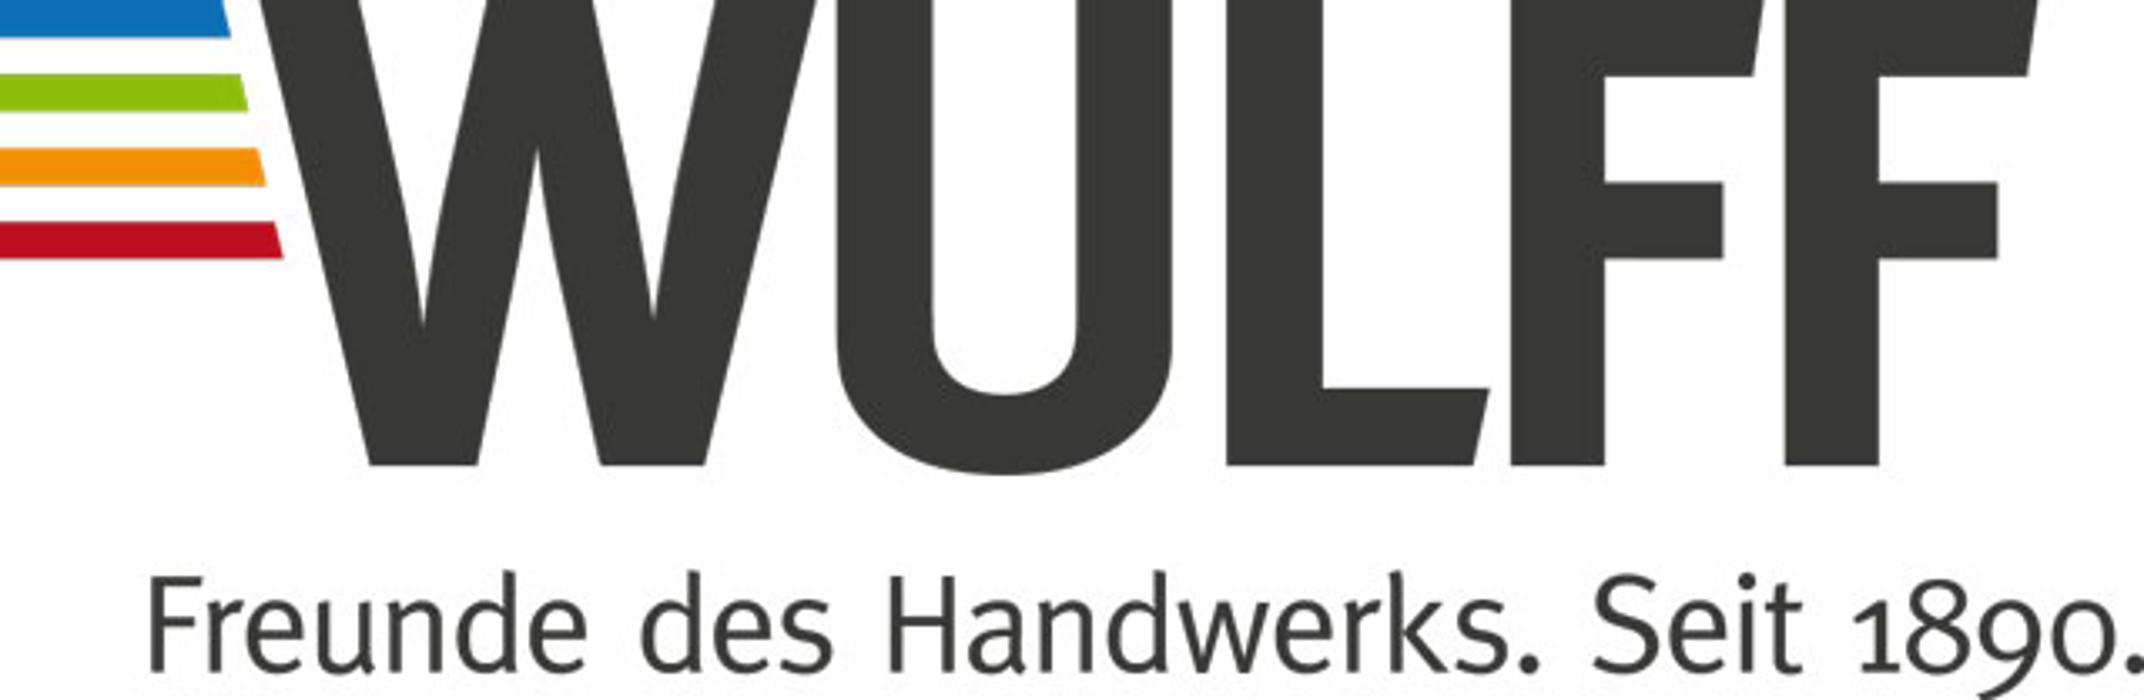 Bild zu Wulff GmbH & Co. KG in Bielefeld